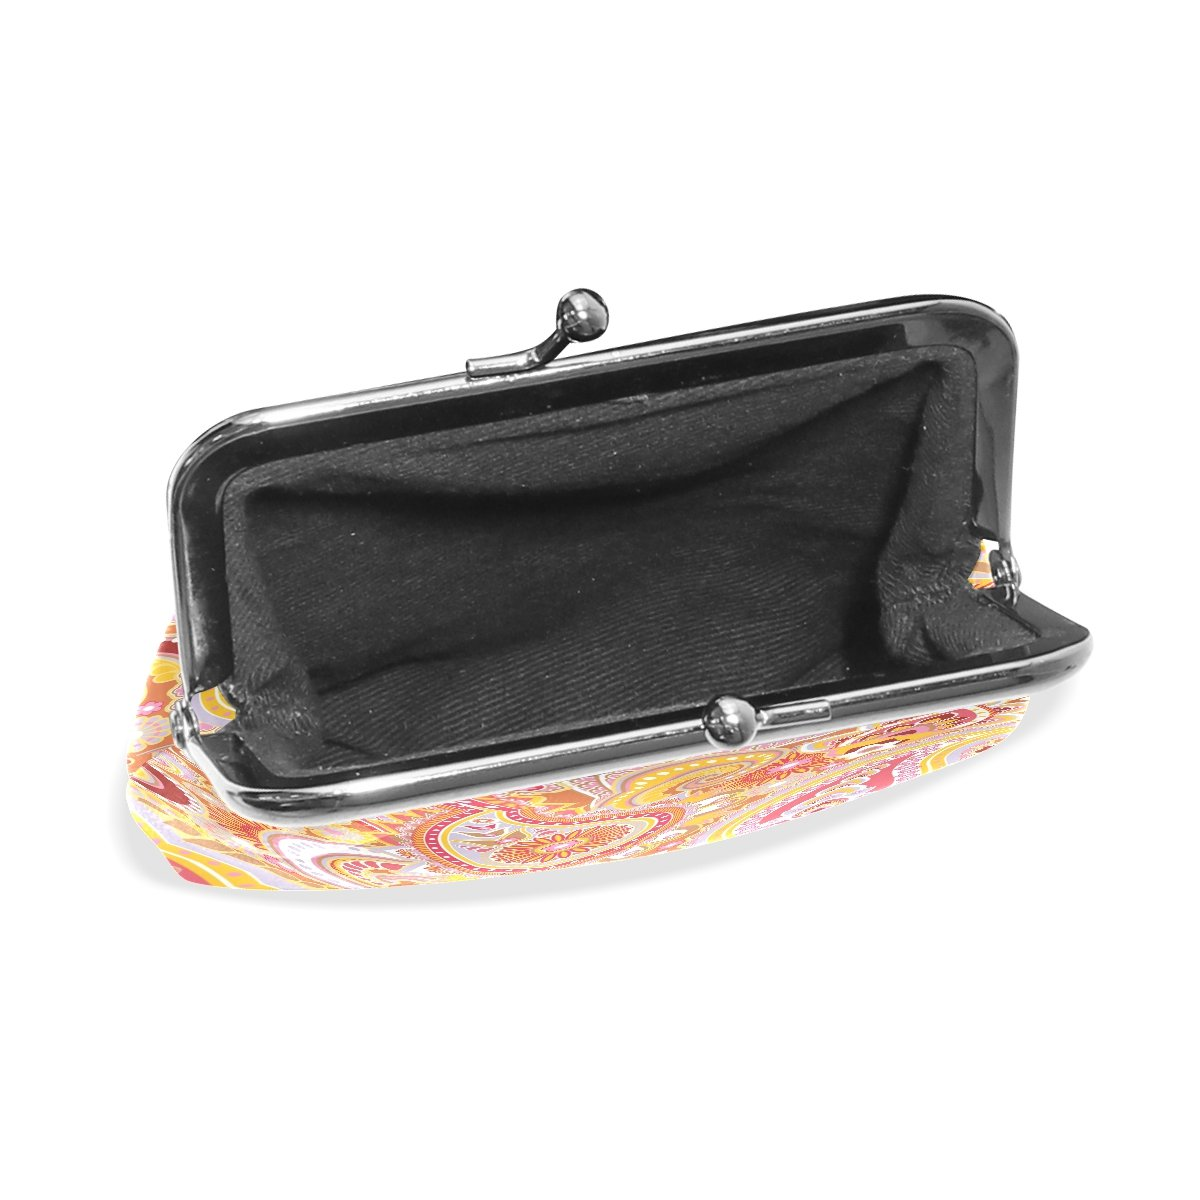 Coin Purse Paisley Wallet Buckle Clutch Handbag For Women Girls Gift